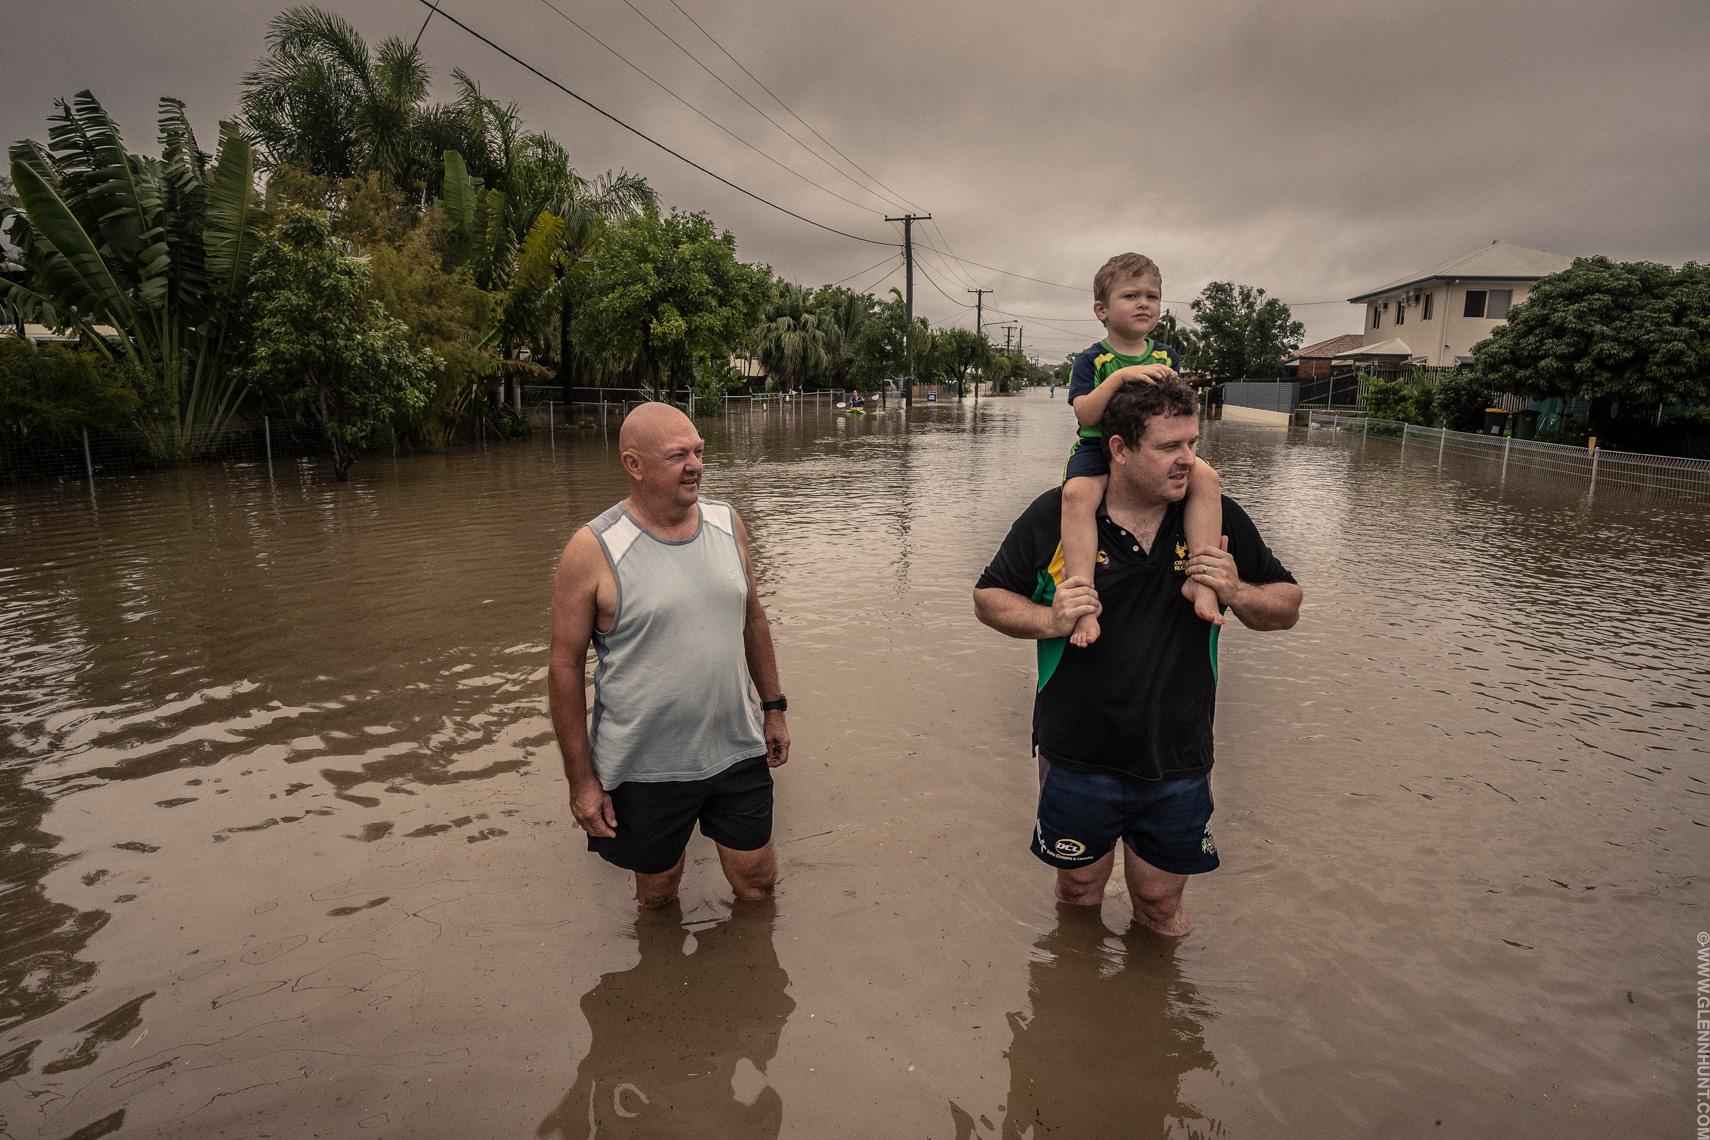 Australian Photojournalism